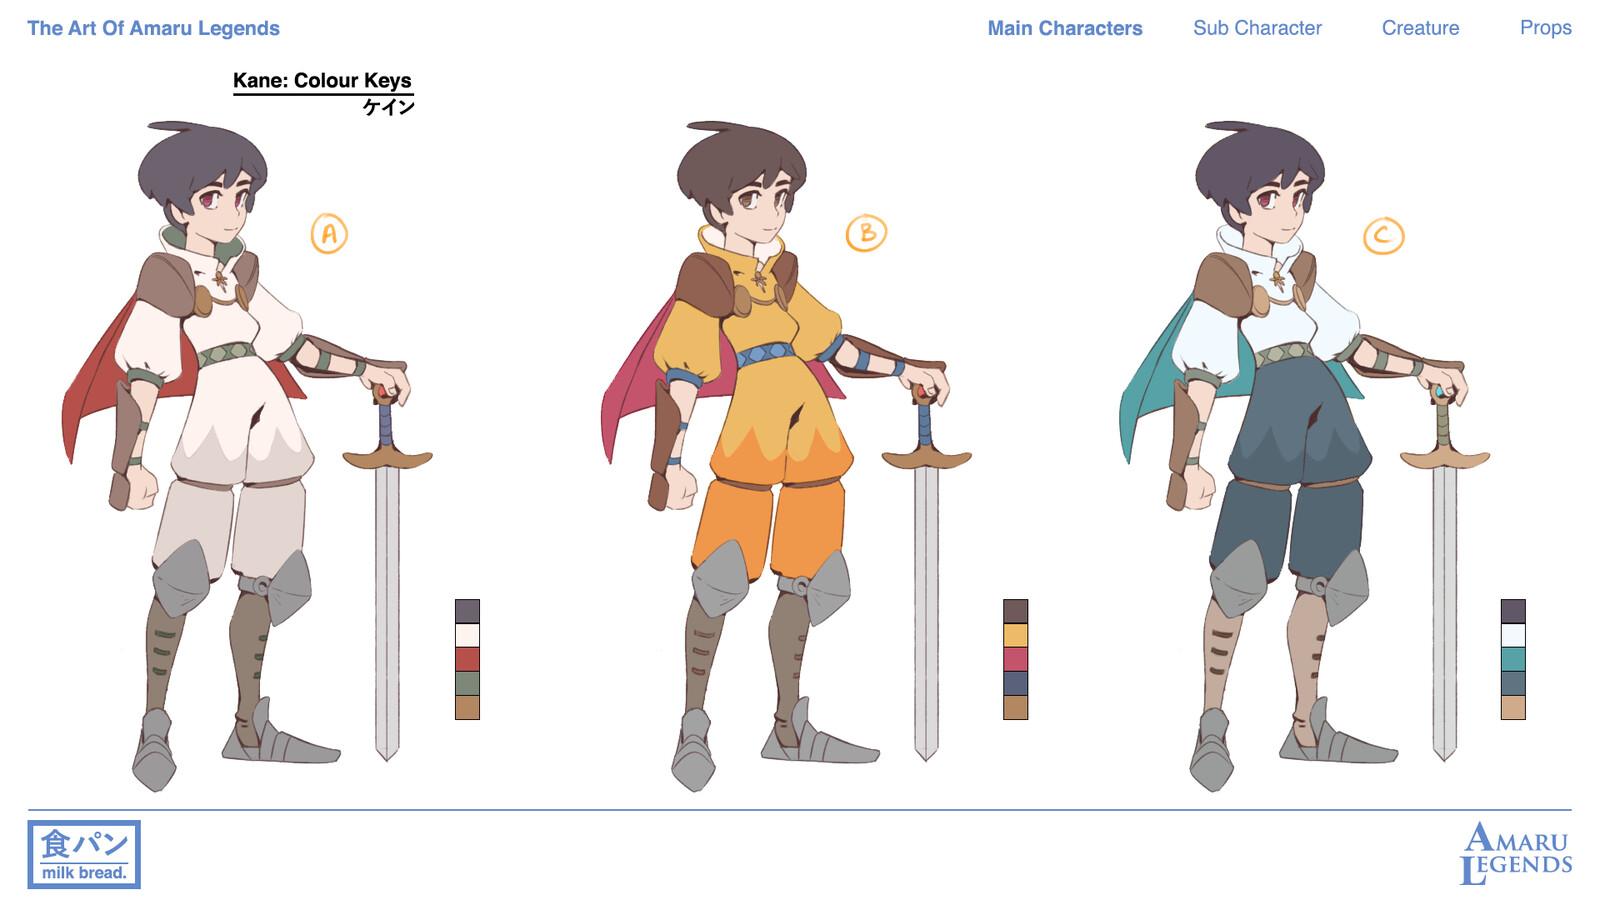 Colour Keys for Main Protagonist